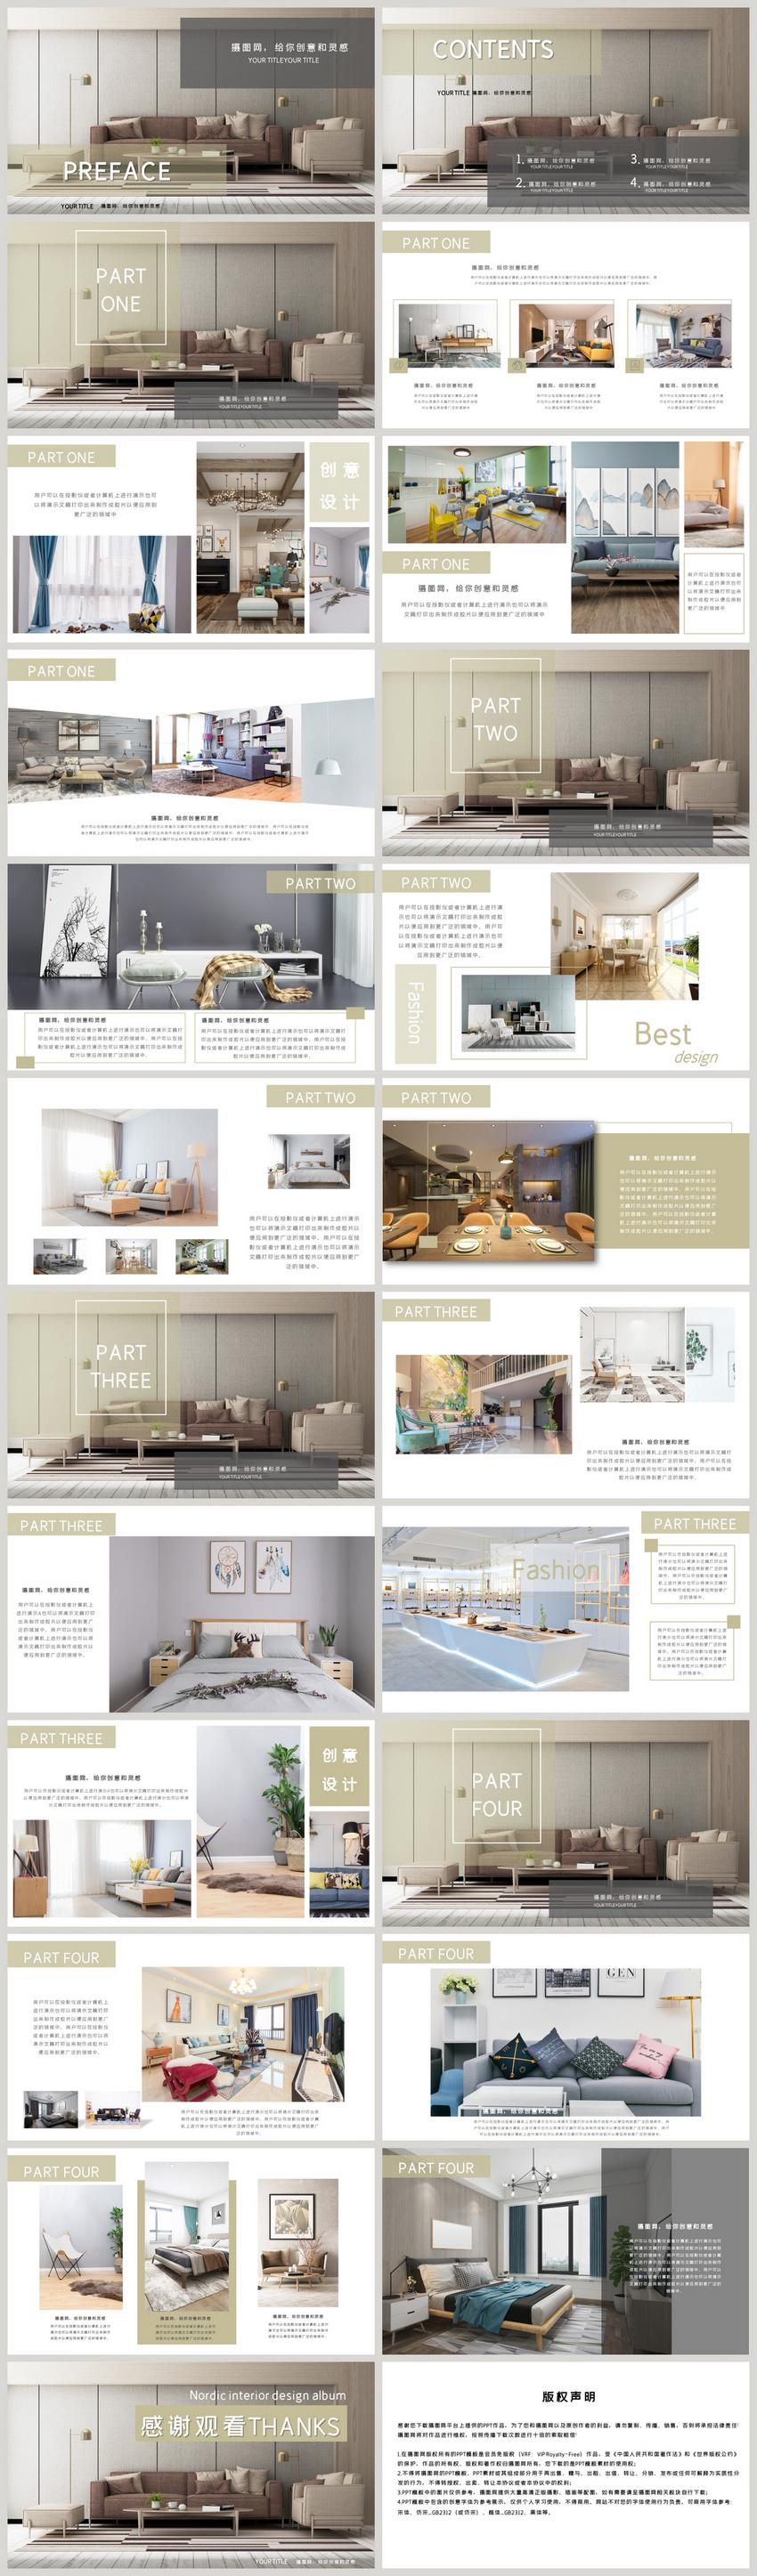 Nordic Style Interior Design Album Ppt Template Powerpoint Templete Ppt Free Download 401693699 Lovepik Com